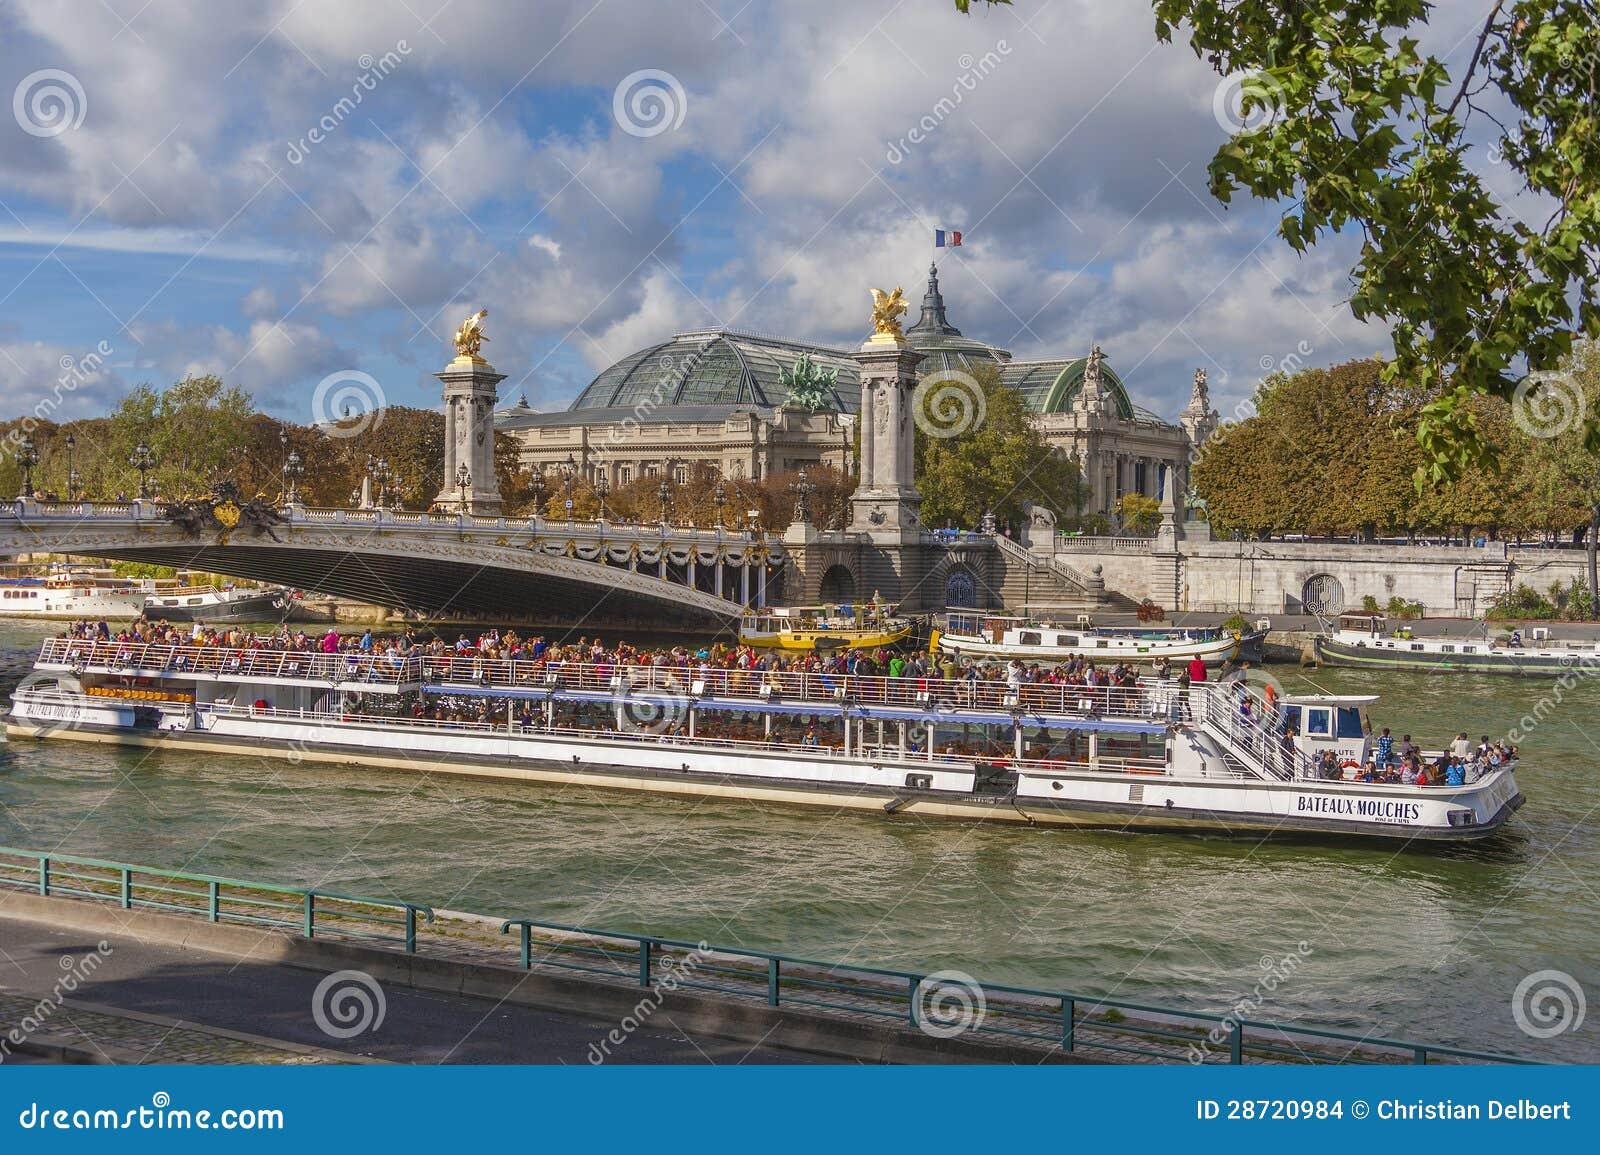 Rominger also Stock Images Bateau Mouche Paris Image28720984 besides Holly Dunn further Dorothy Mcguire besides Image Libre De Droits Hall D Entre De Local  mercial Image15680726. on delbert hall